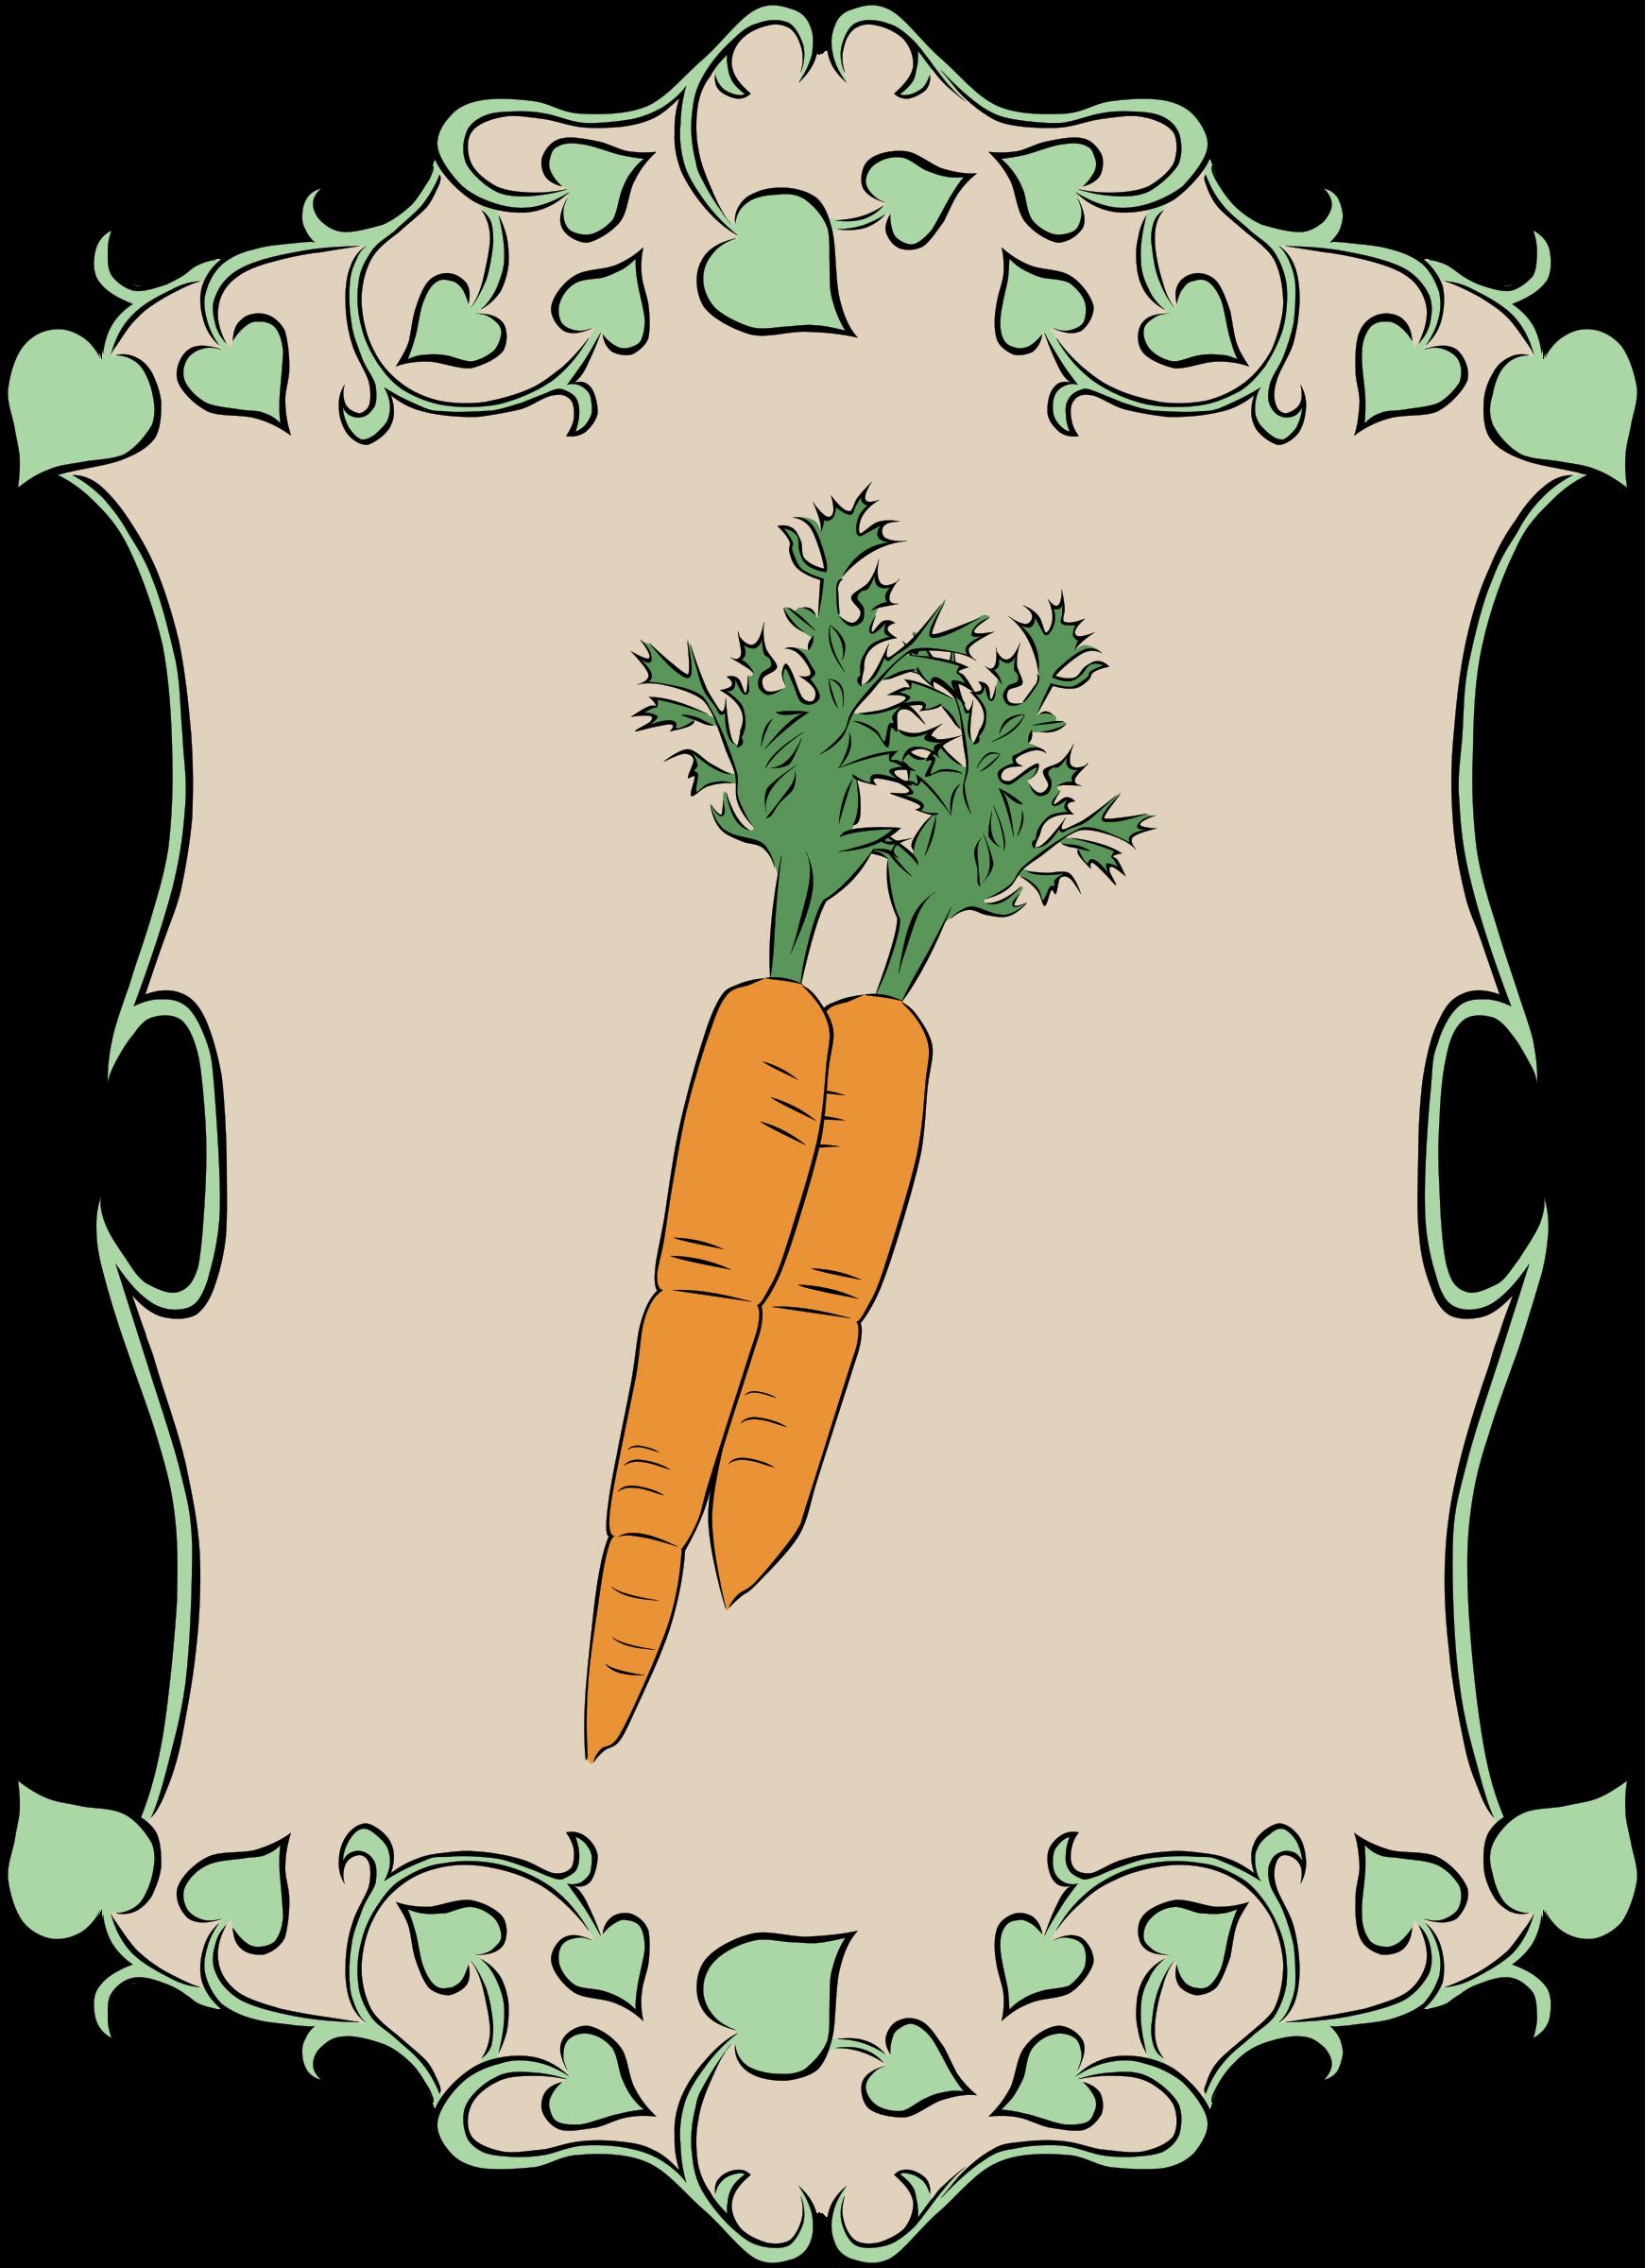 Sign carrots big image. Garden clipart carrot